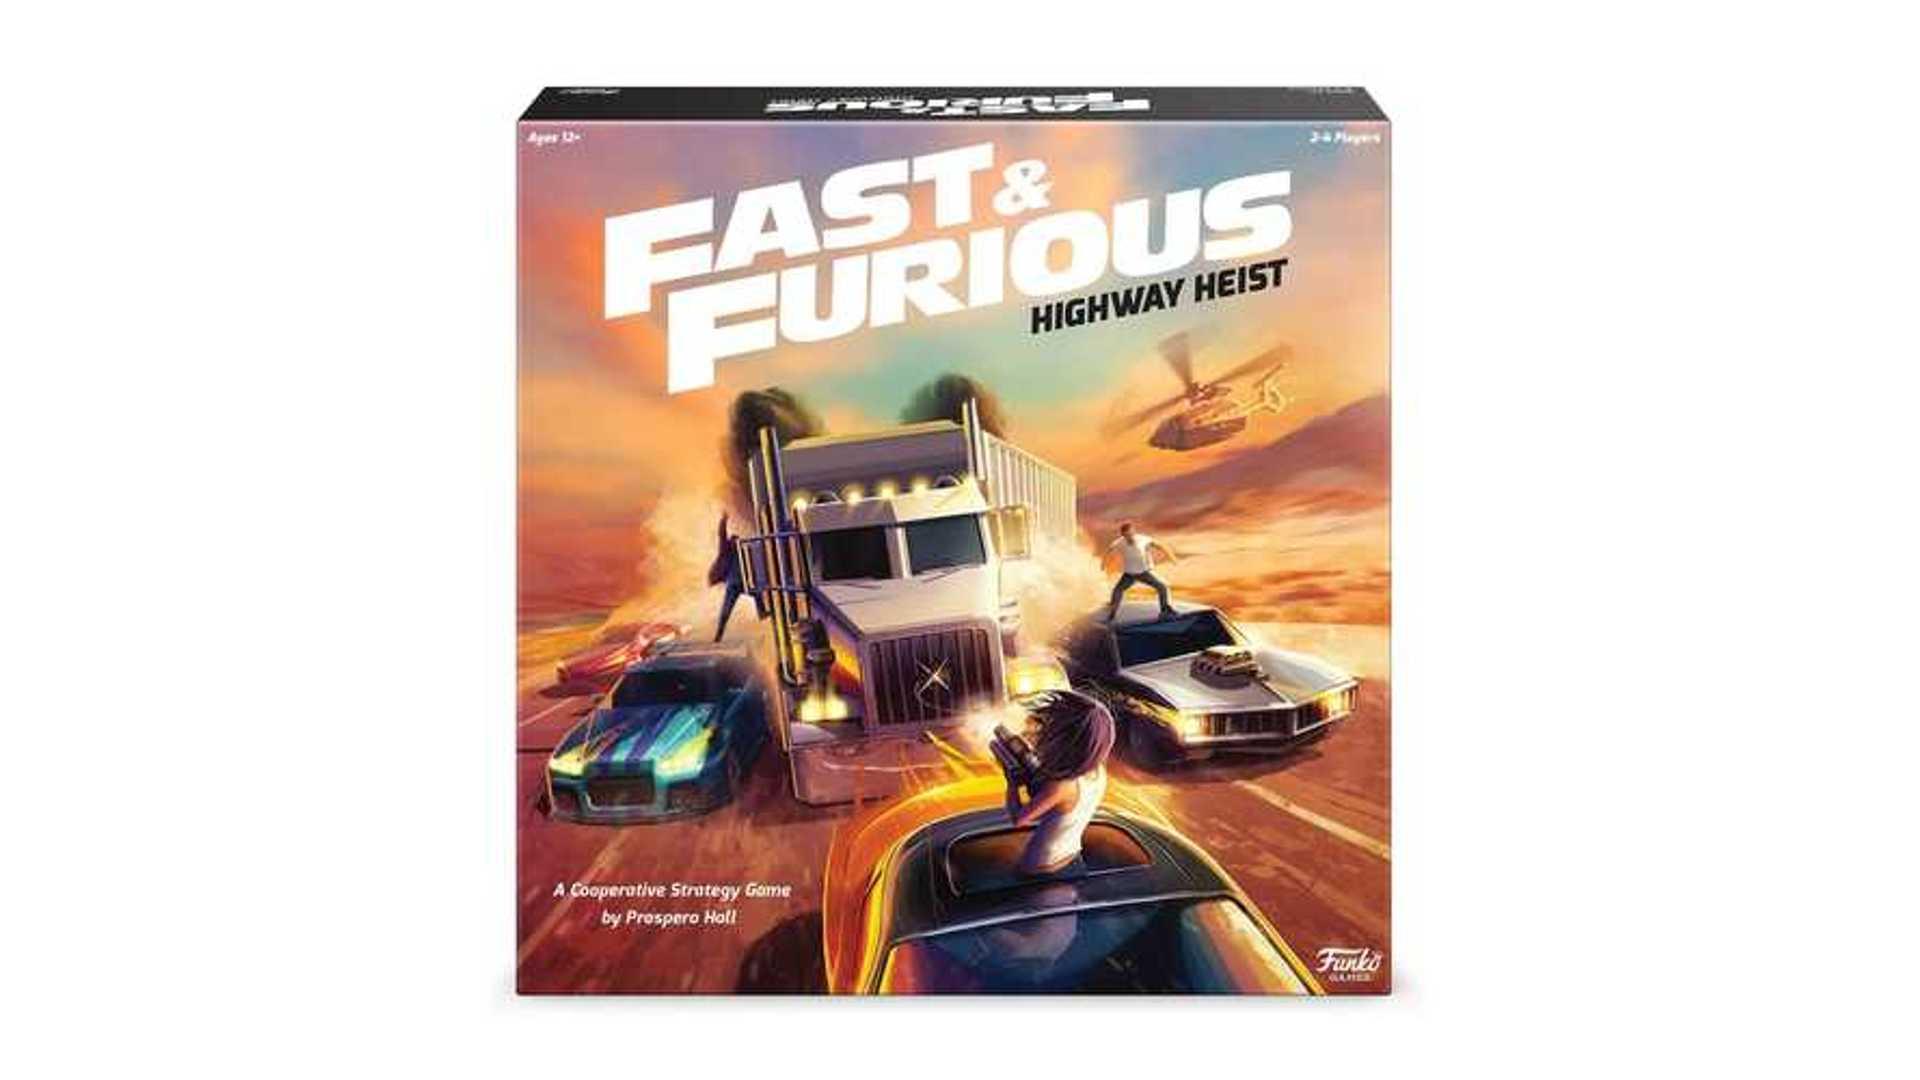 https://cdn.motor1.com/images/mgl/28z8p/s6/fast-furious-highway-heist-board-game.jpg